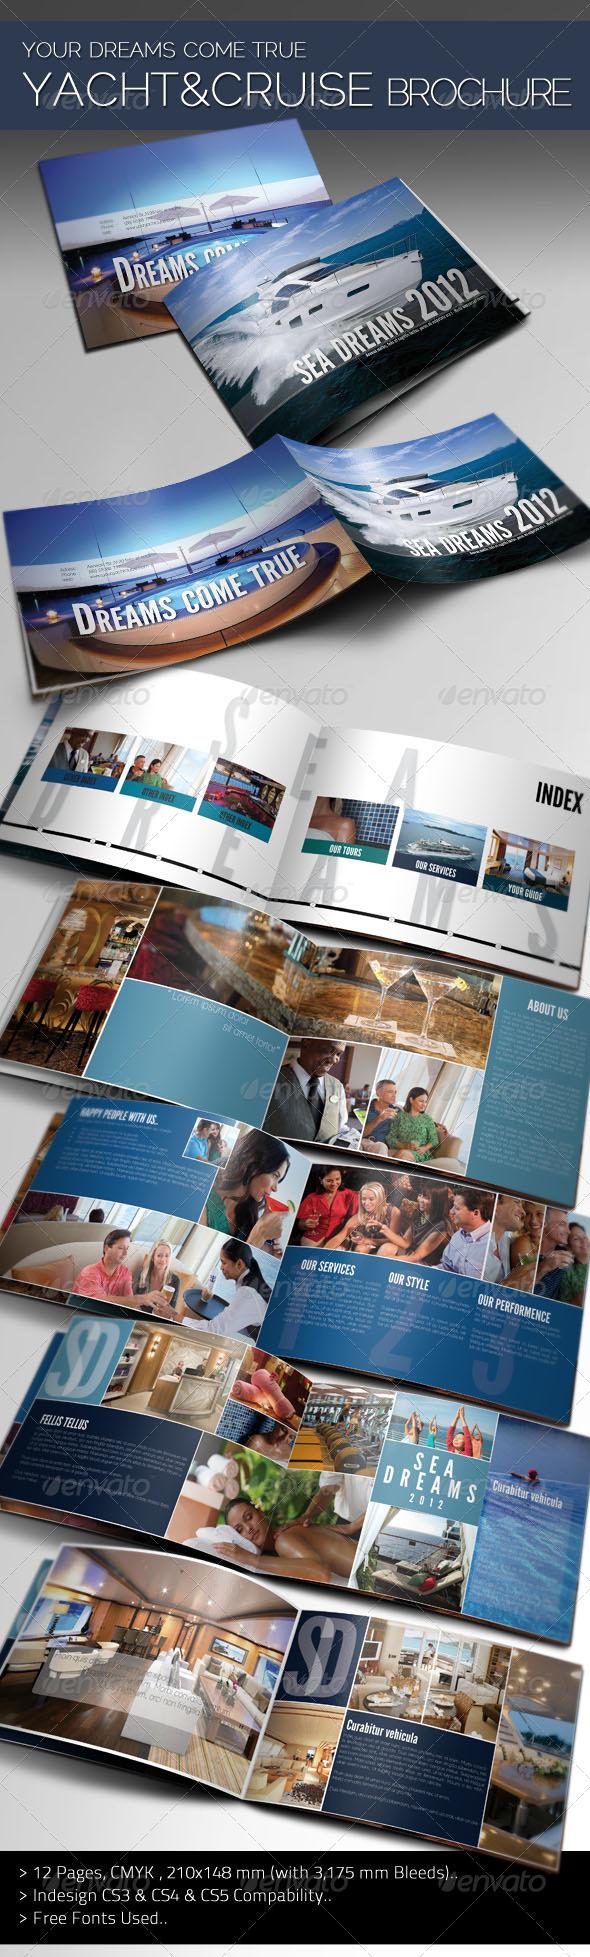 GraphicRiver Sea Dreams Yacht & Cruise Brochure 2217880